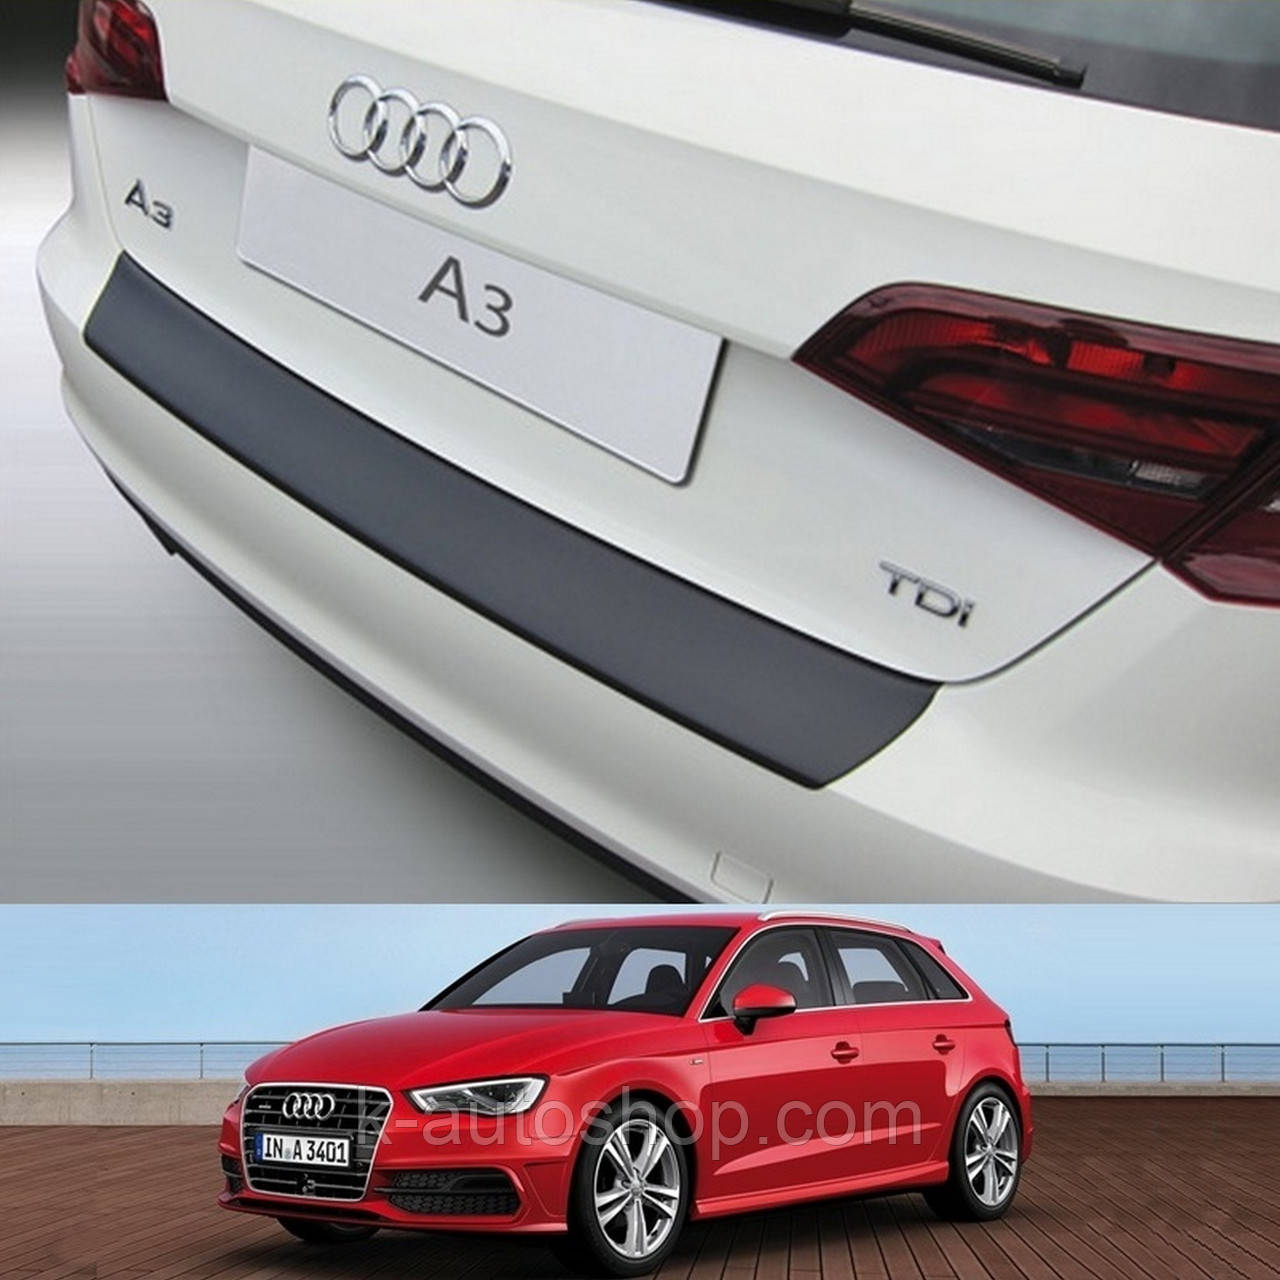 Пластиковая защитная накладка на задний бампер для Audi A3 / S3 5Dr Sportback 2012+